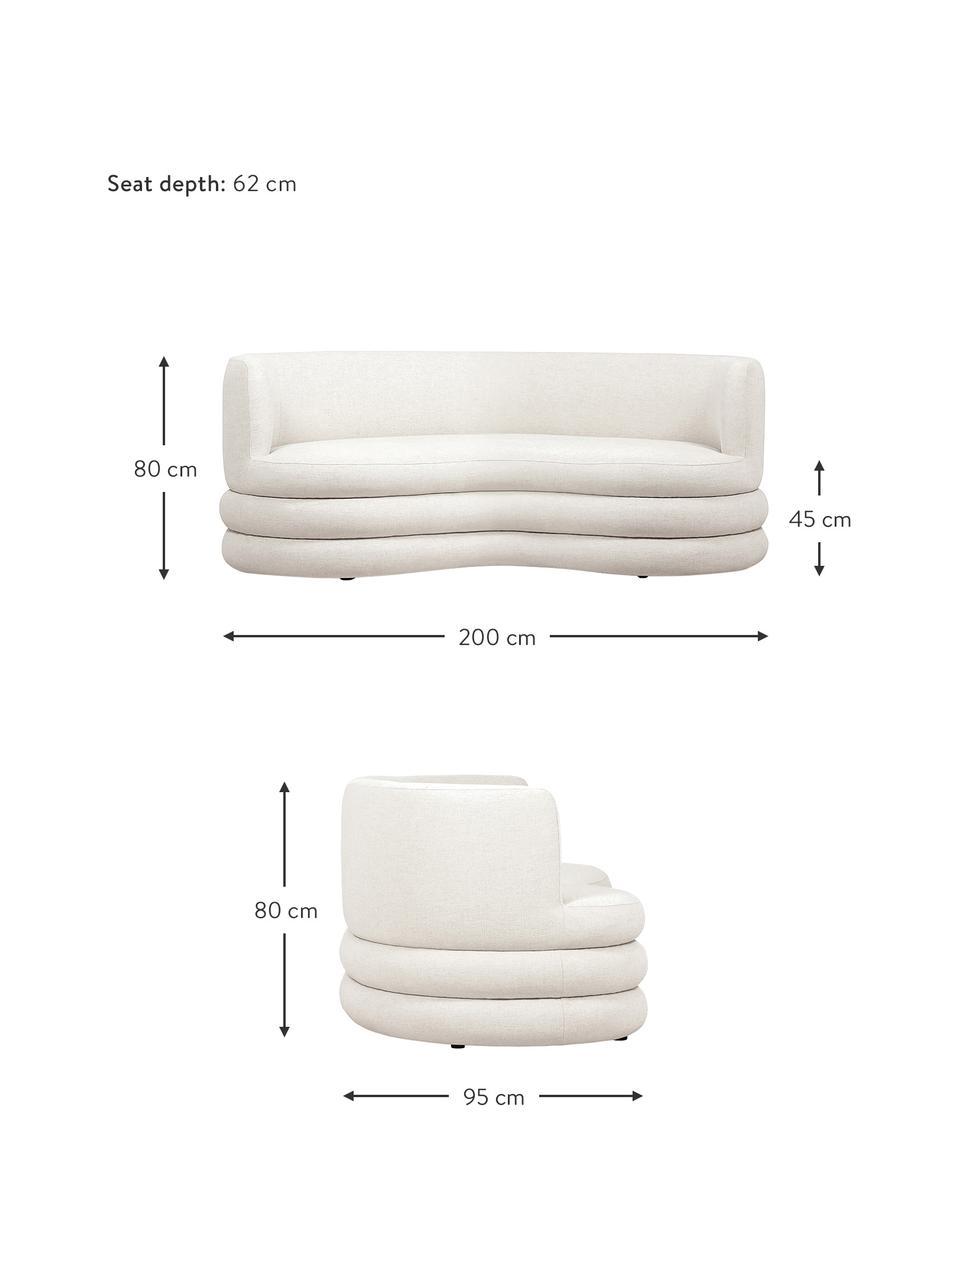 Designer Sofa Solomon (3-Sitzer) in Beige, Bezug: 56% Viskose, 21% Polyeste, Gestell: Massives Fichtenholz, Bir, Füße: Kunststoff, Webstoff Beige, B 200 x T 95 cm